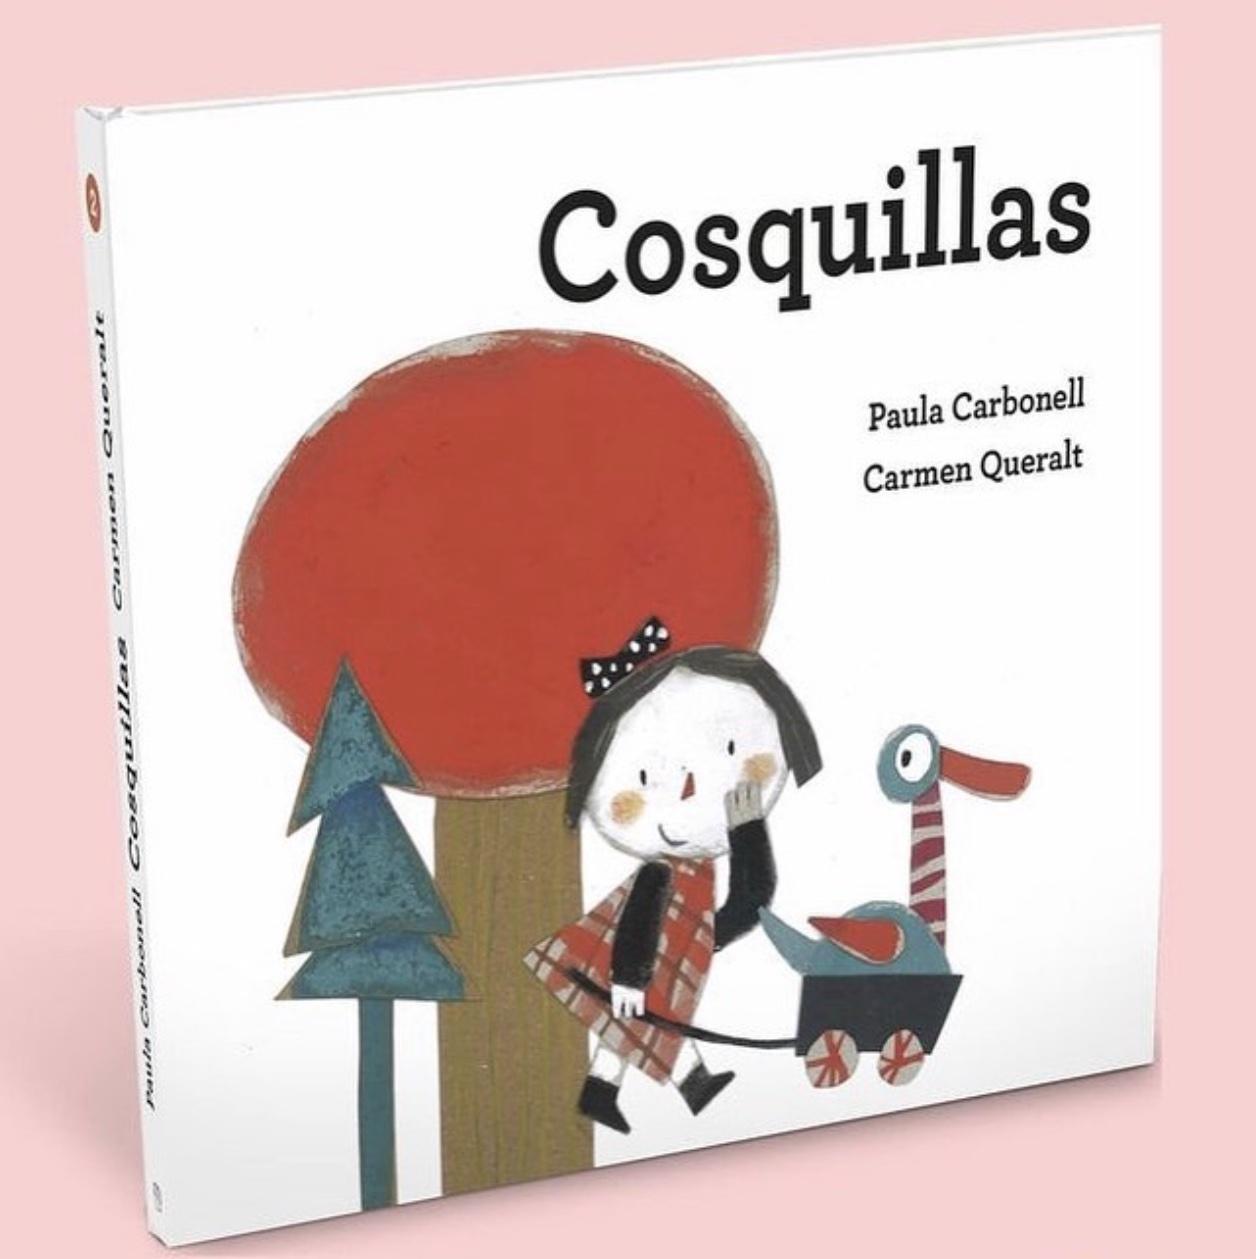 COSQUILLAS